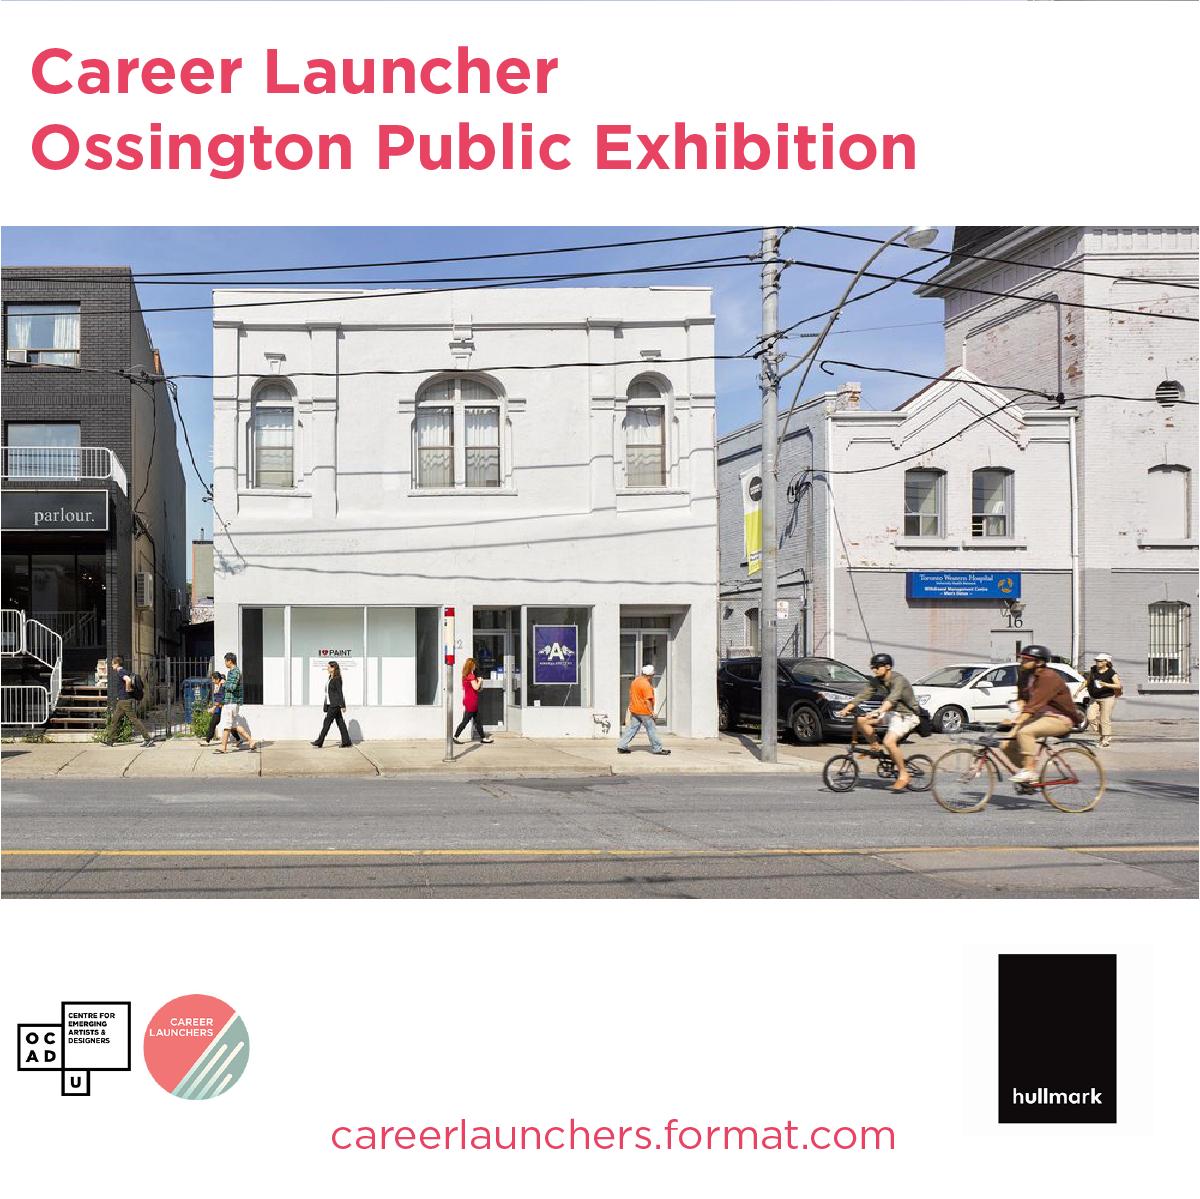 Career Launcher Ossington Public Exhibition 2019